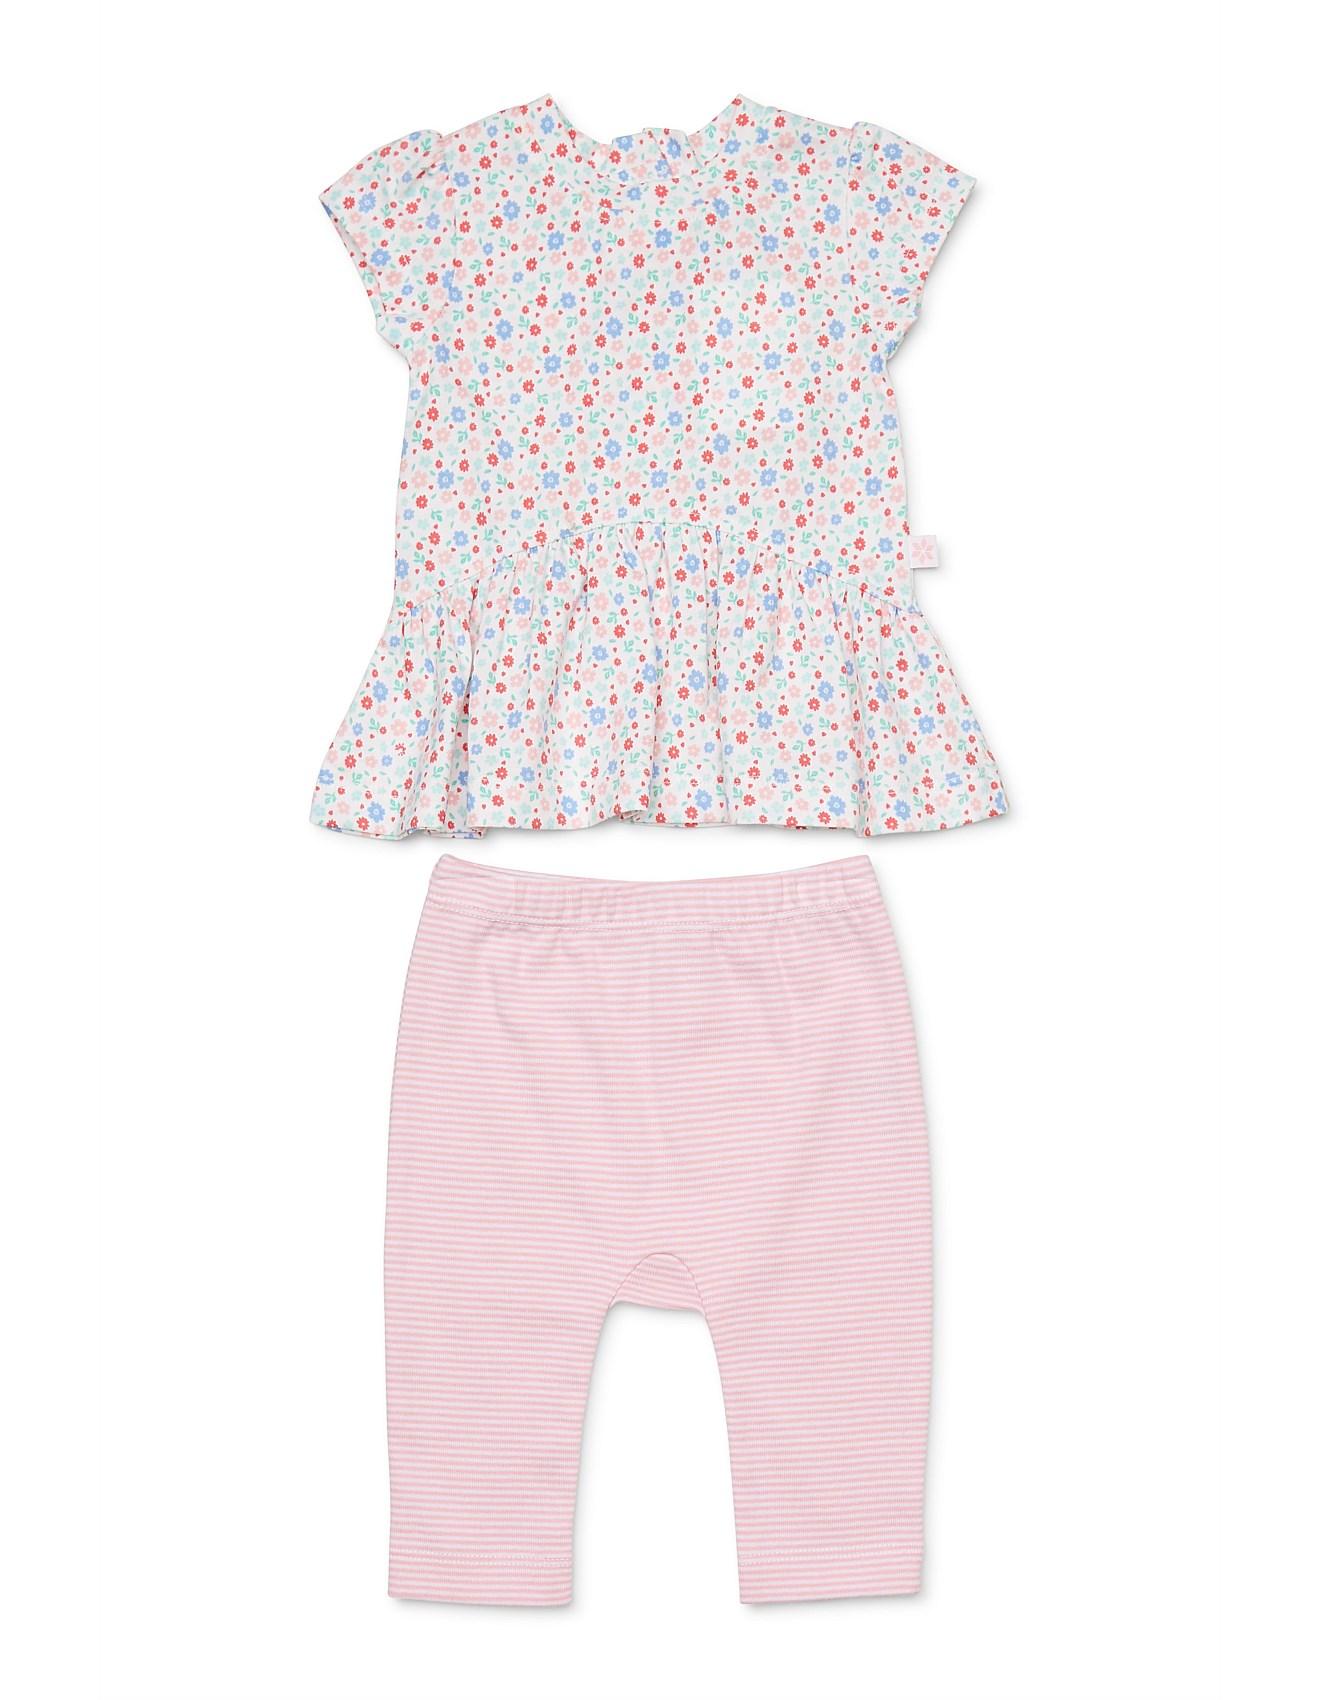 Baby Clothing Sale Buy Baby Clothes Accessories David Jones